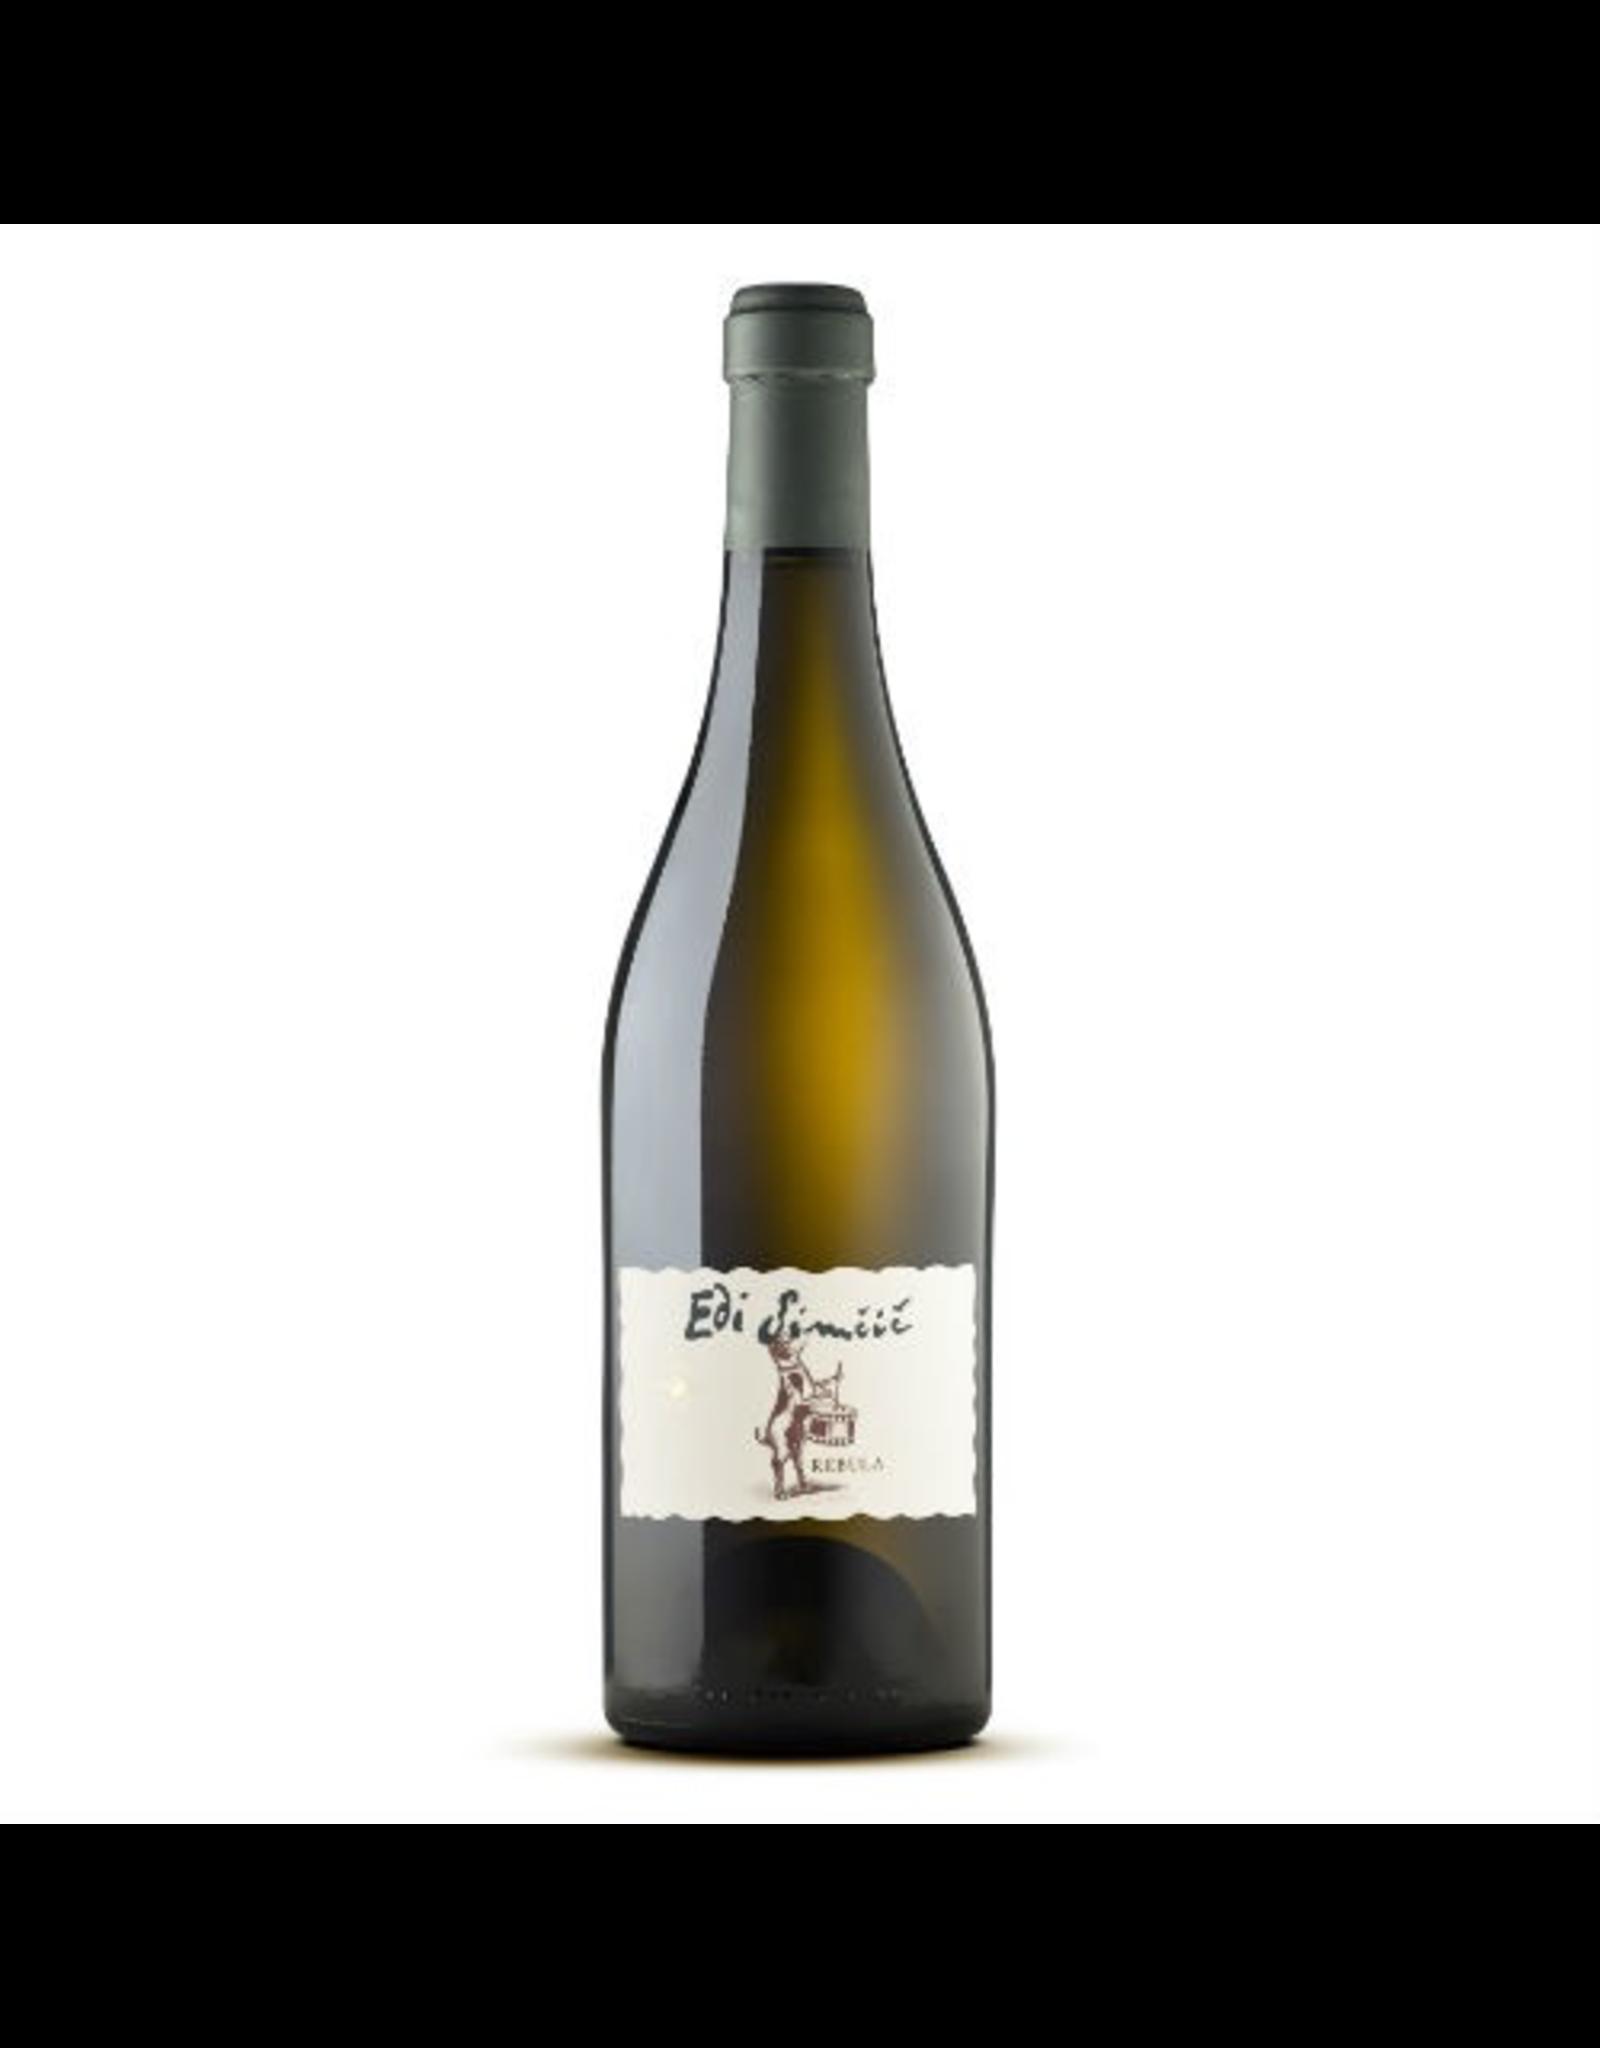 White Wine 2014, Edi Simcic, Rebula, Goriska Brda, Slovenia, 12% Alc, CTnr, TW92